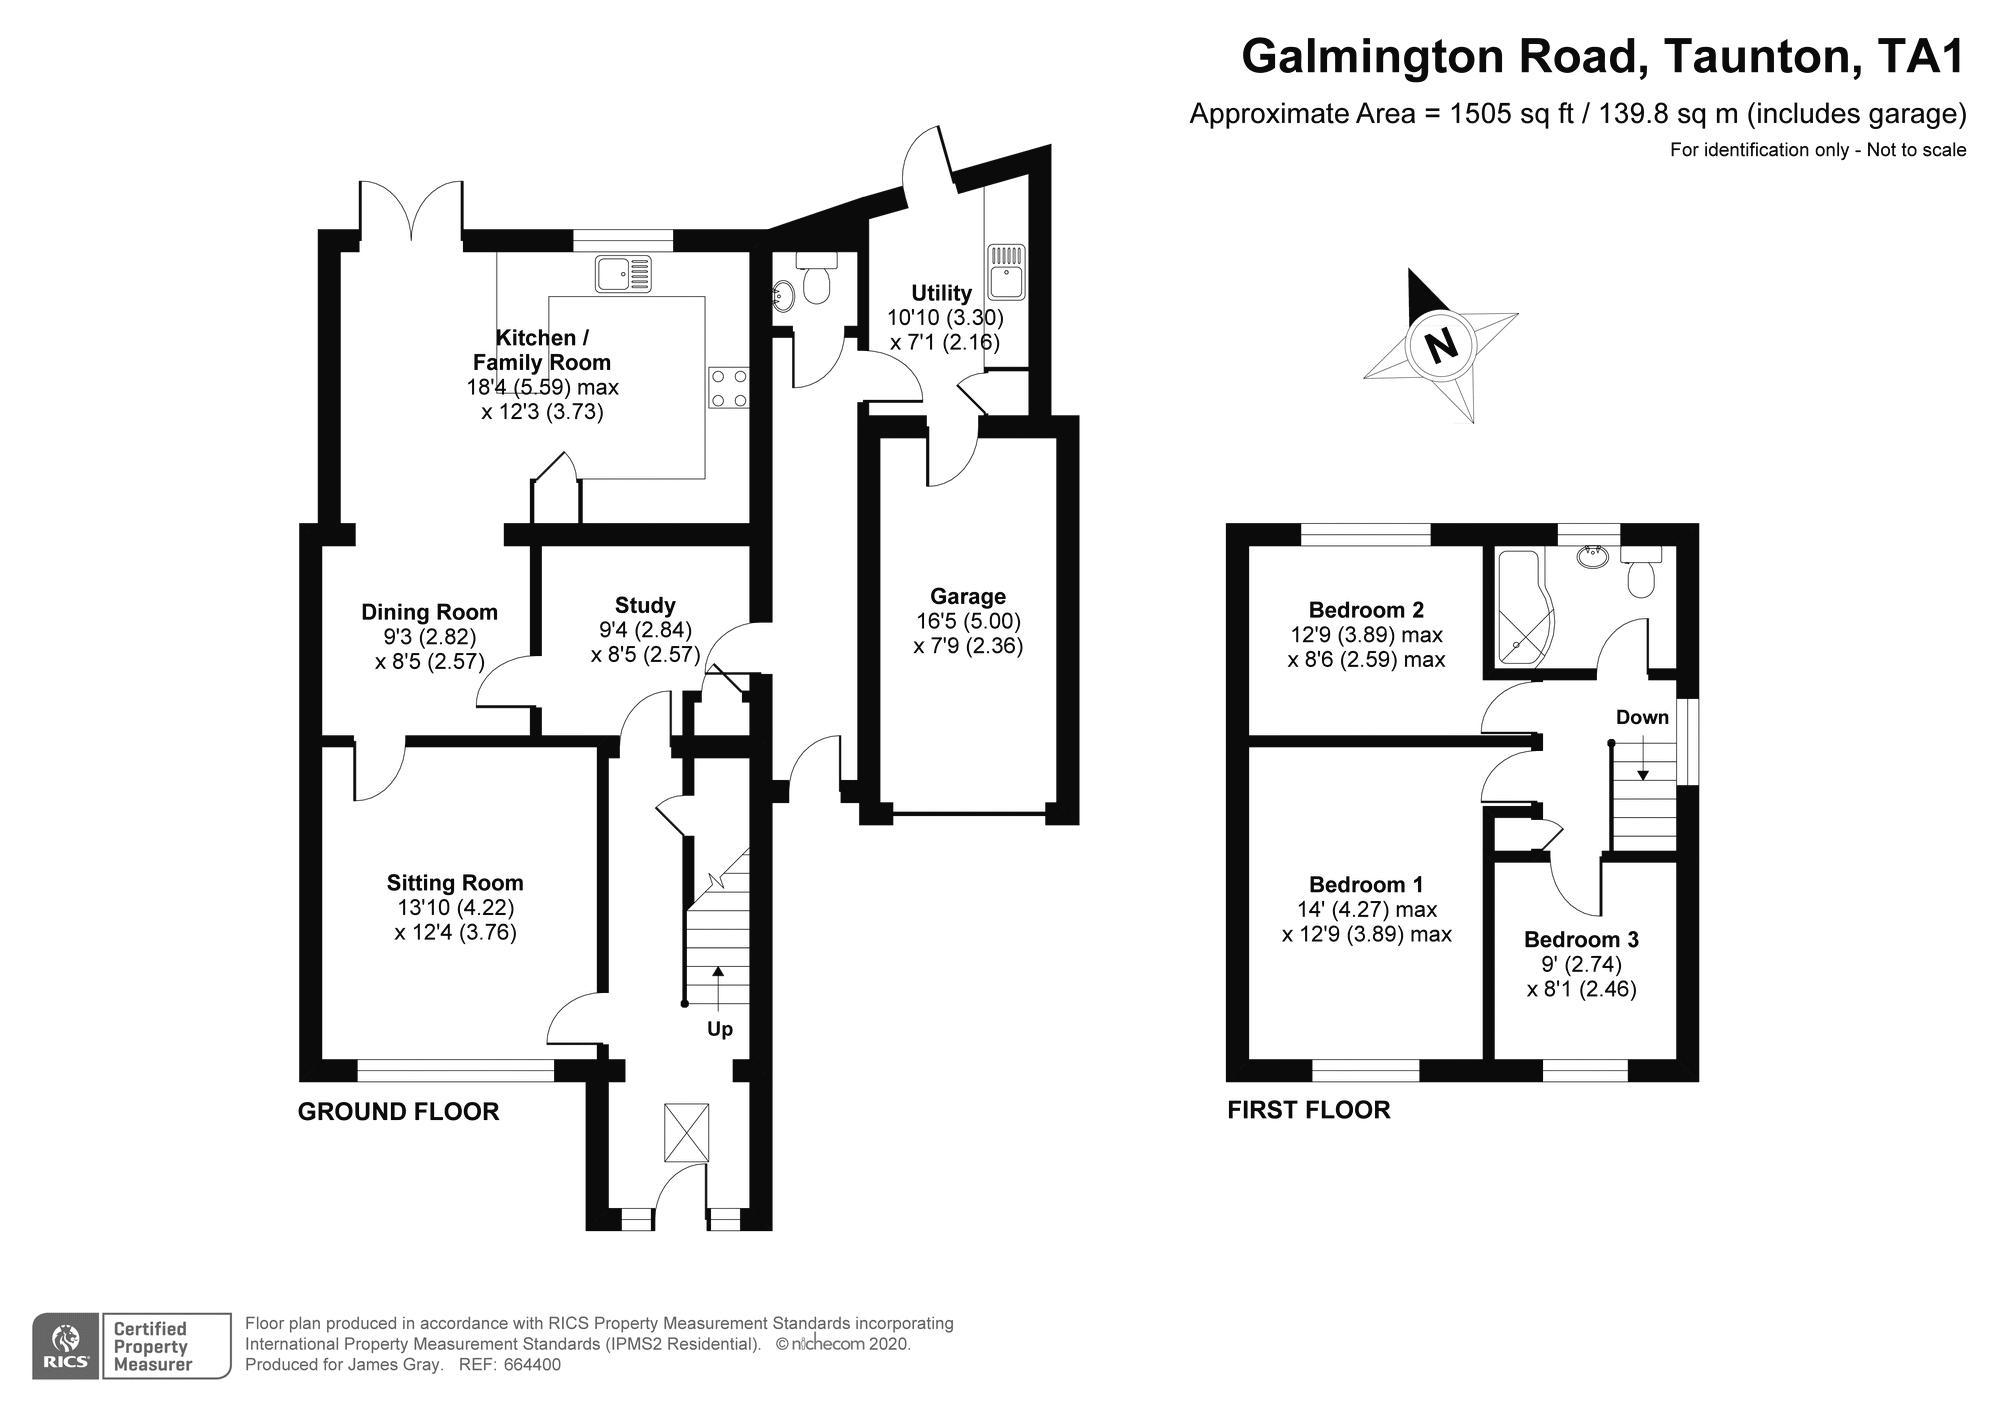 Galmington Road